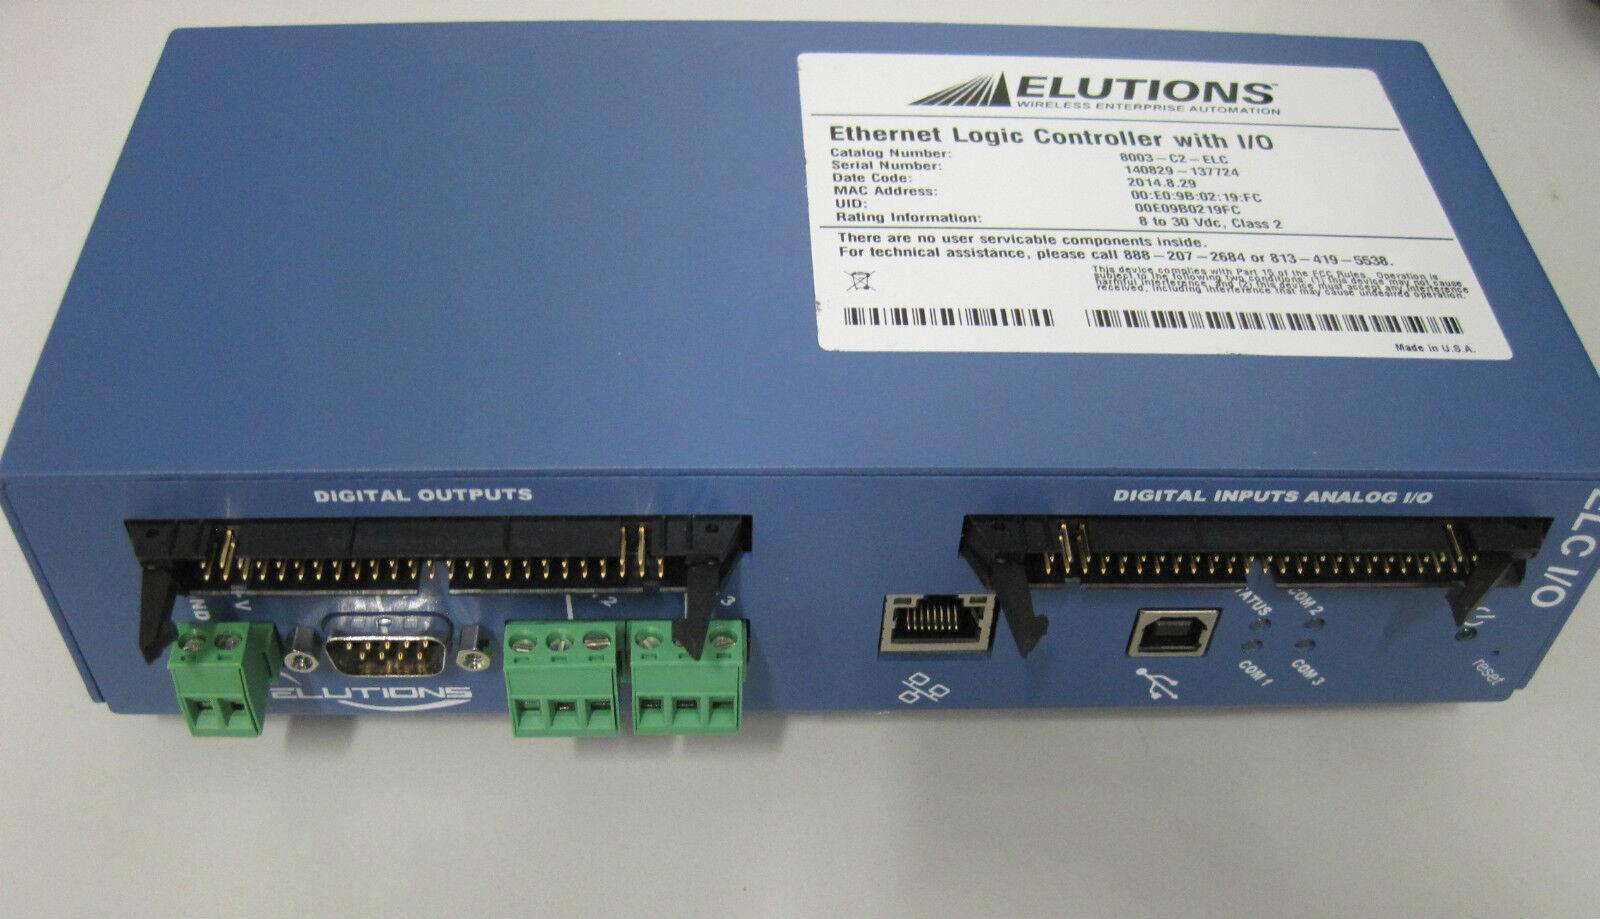 Elutions Ethernet Logic Controller with I 0 ELC Modbus-RTU Steuerung NEU   NEW